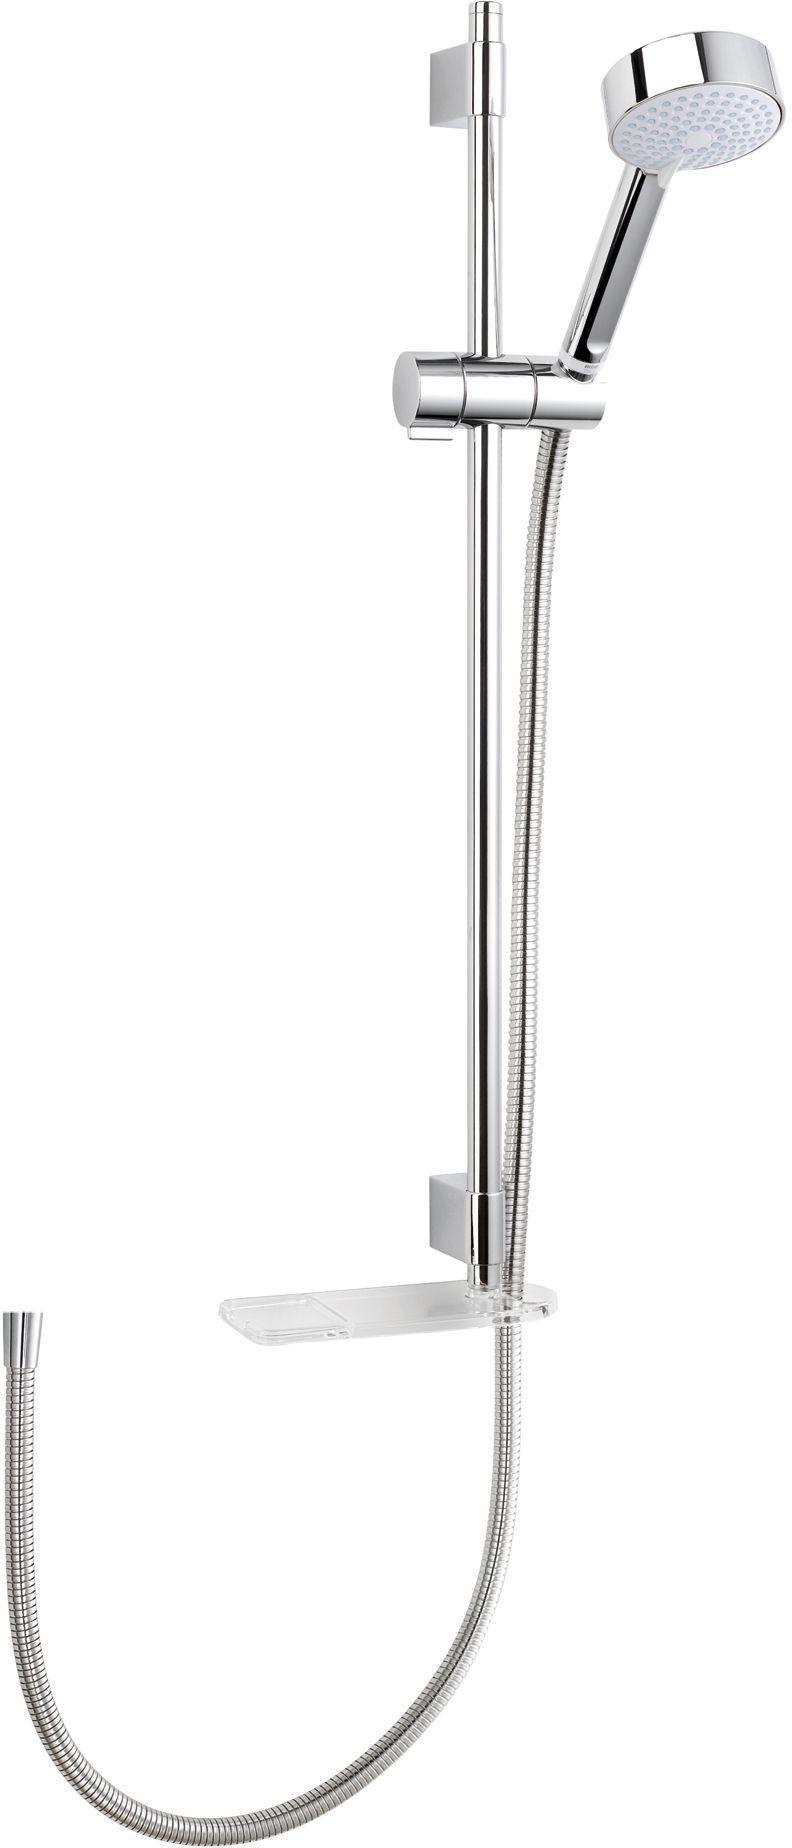 mira-beat-4-mode-shower-kit